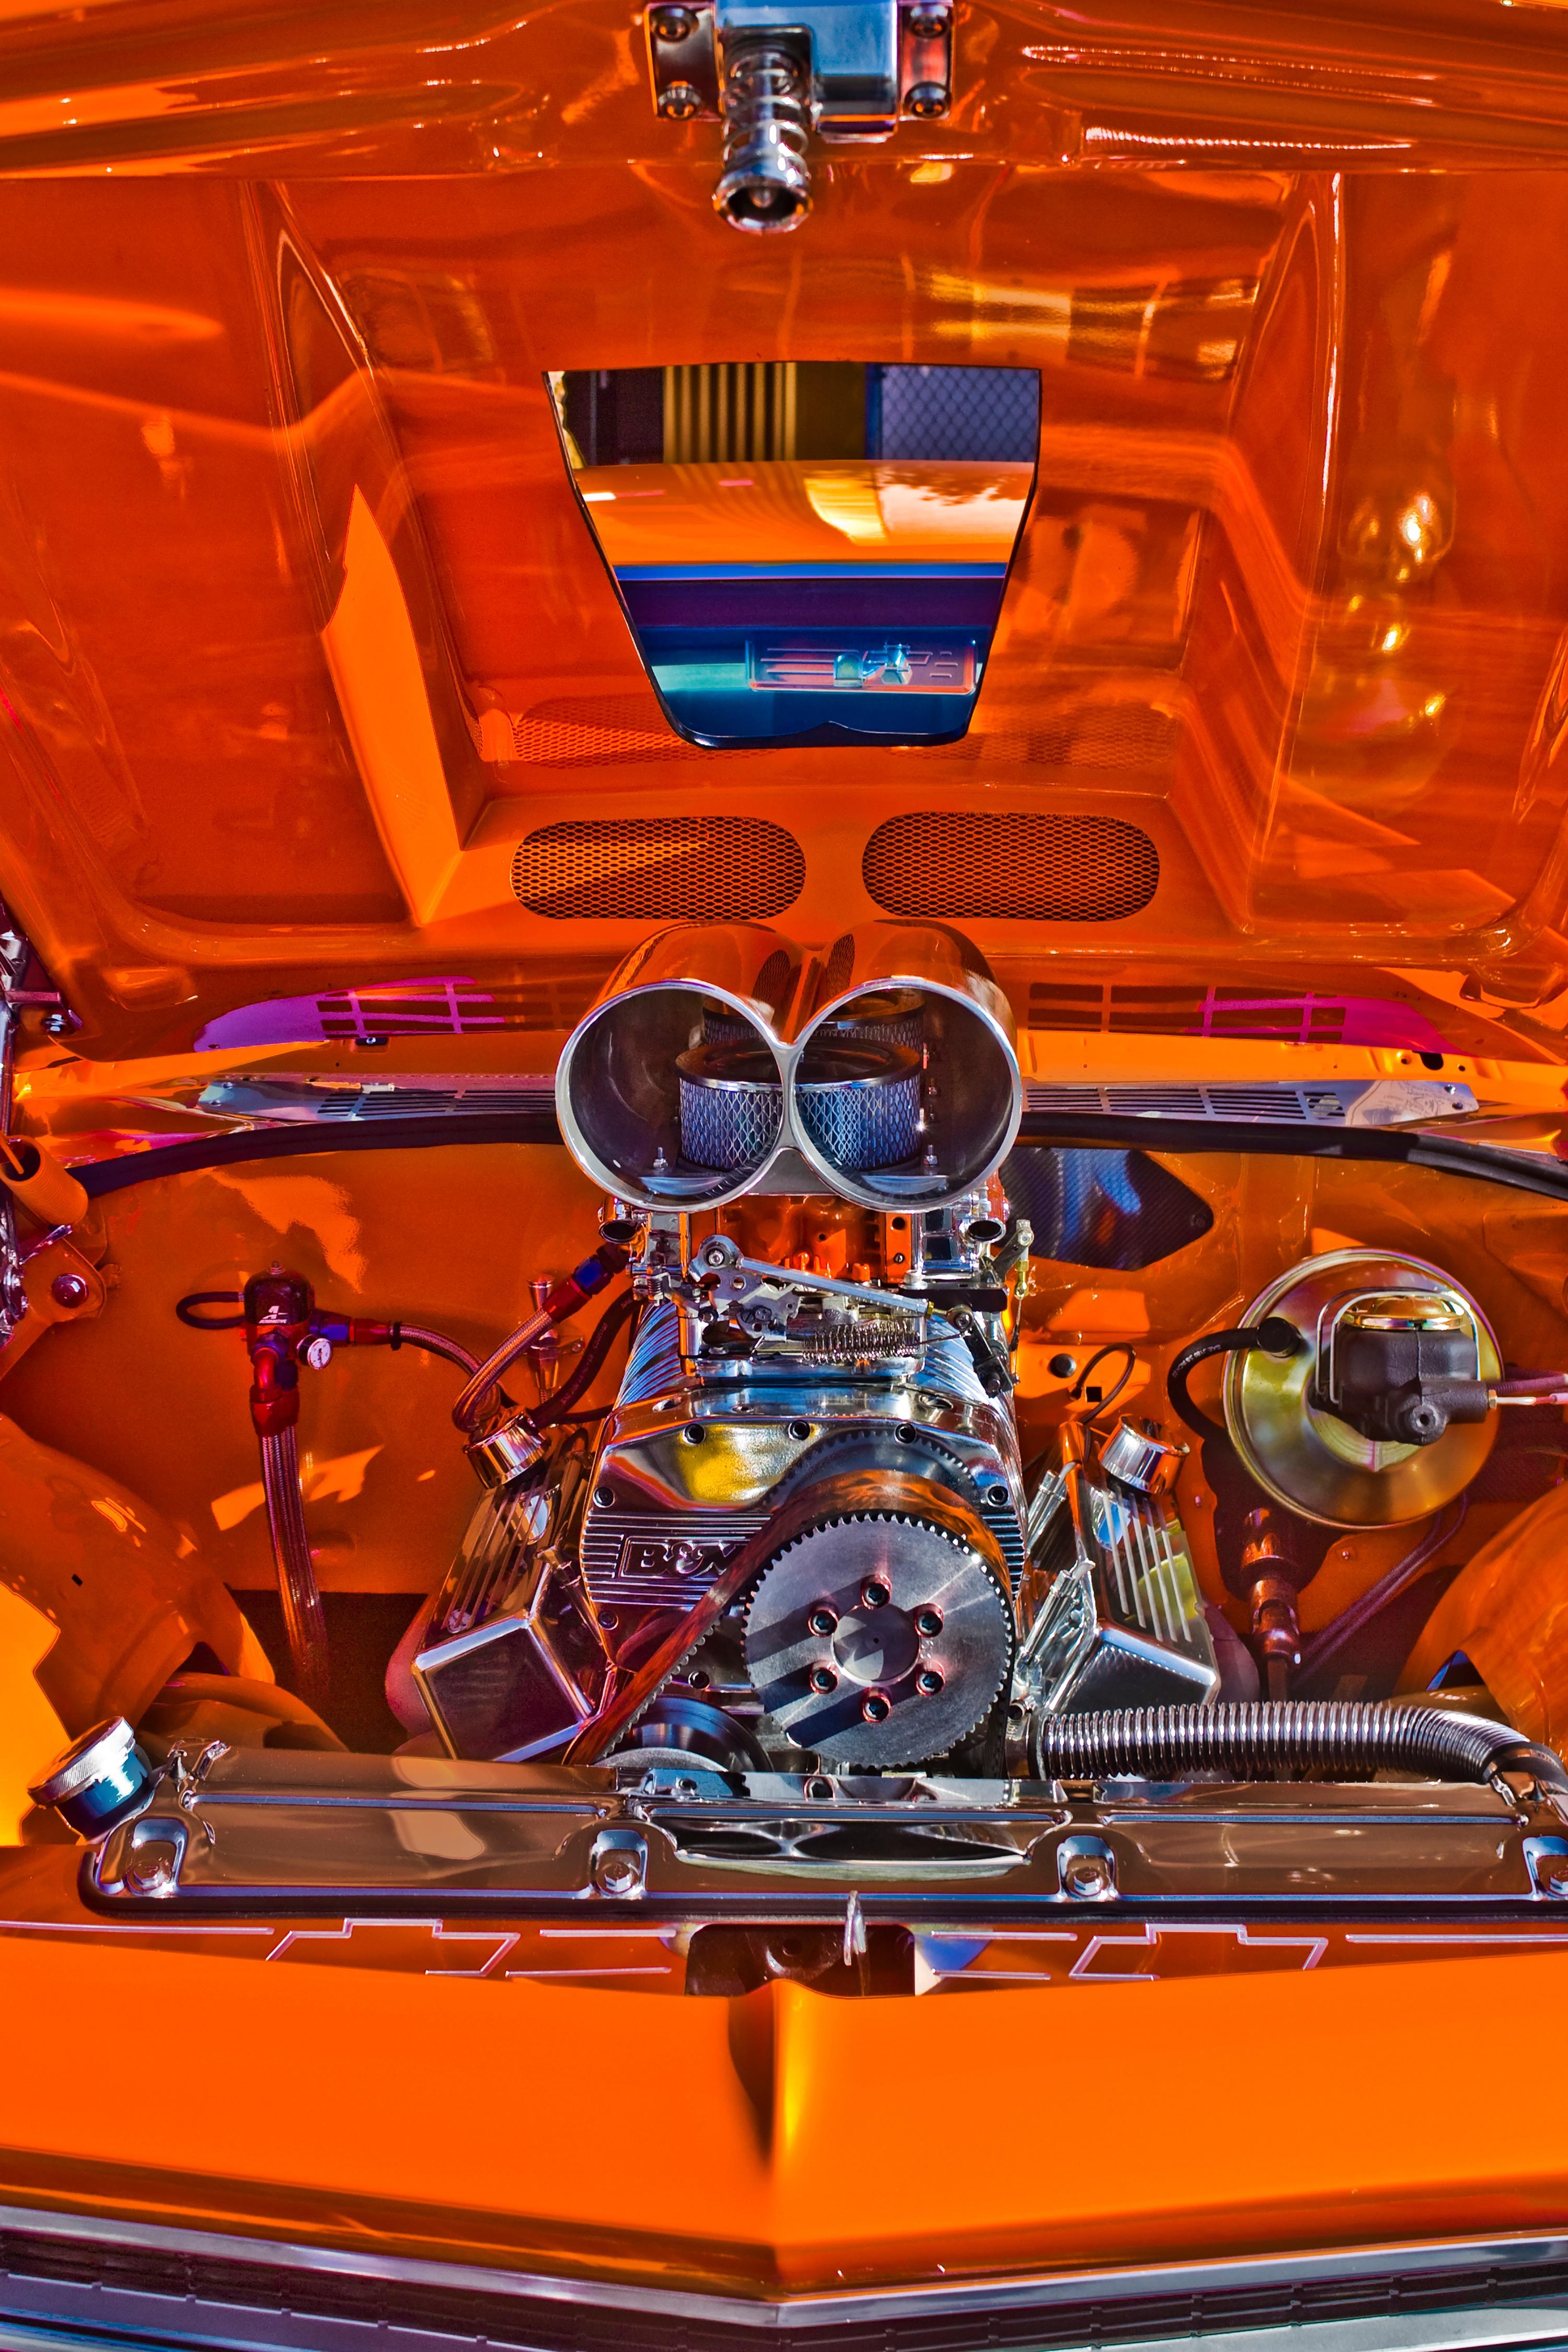 car-orange-vehicle-engine-chevy-games-sc